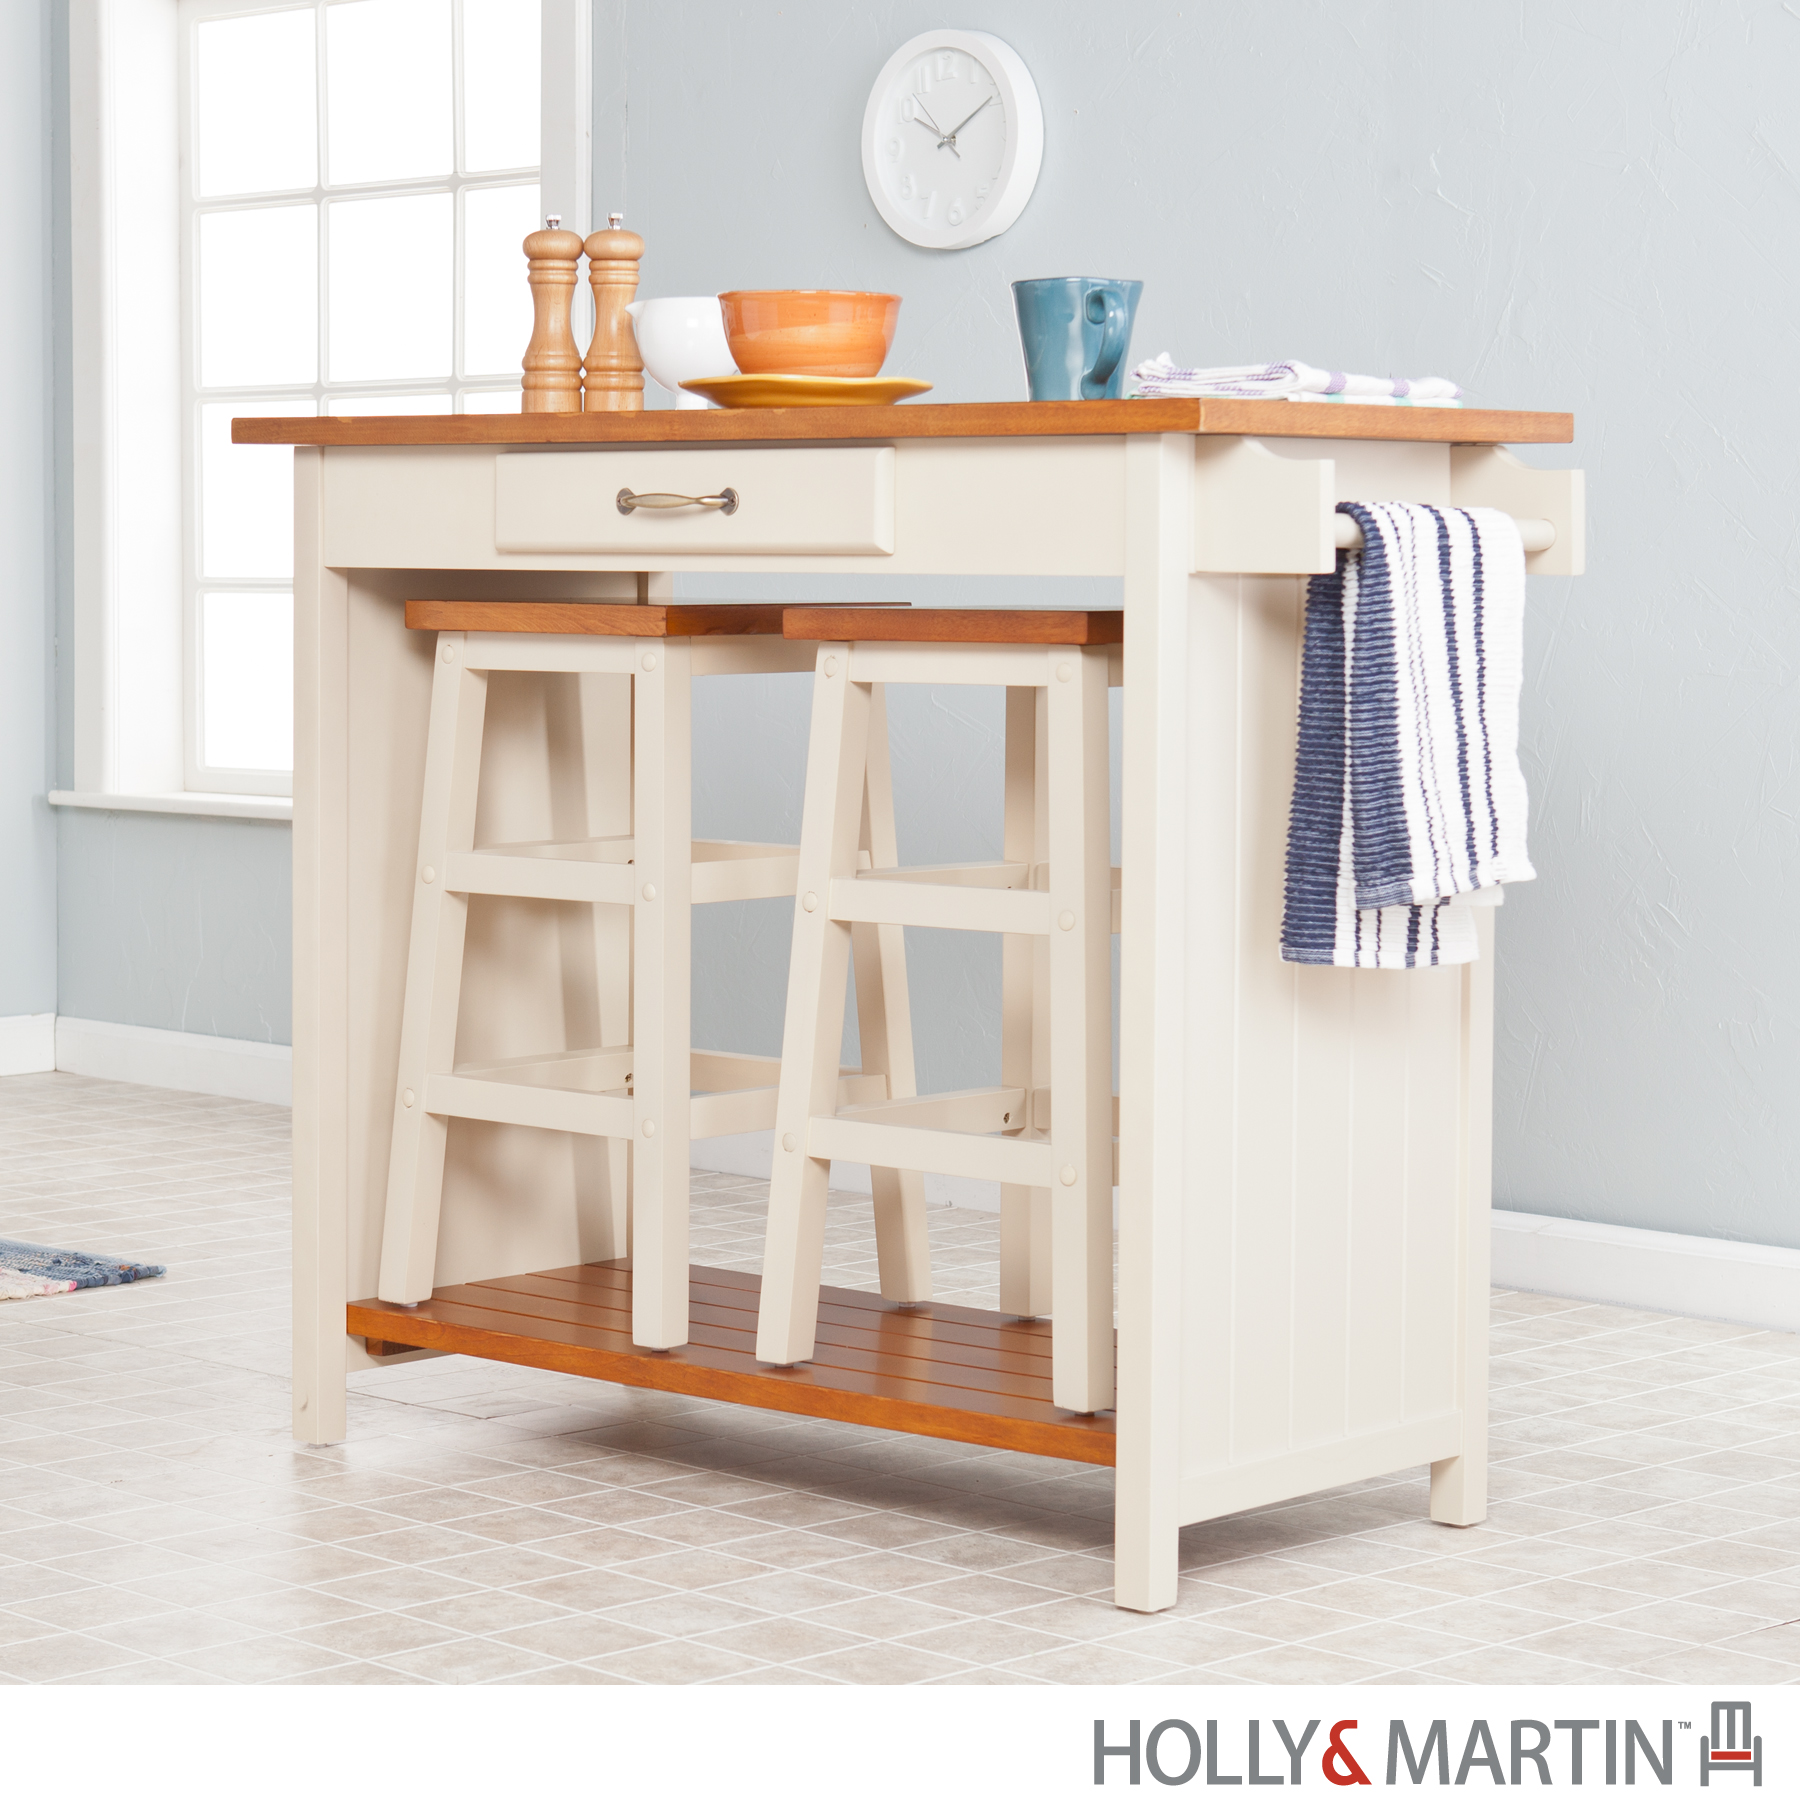 3 piece kitchen set backsplash ideas on a budget breakfast bar with stools white